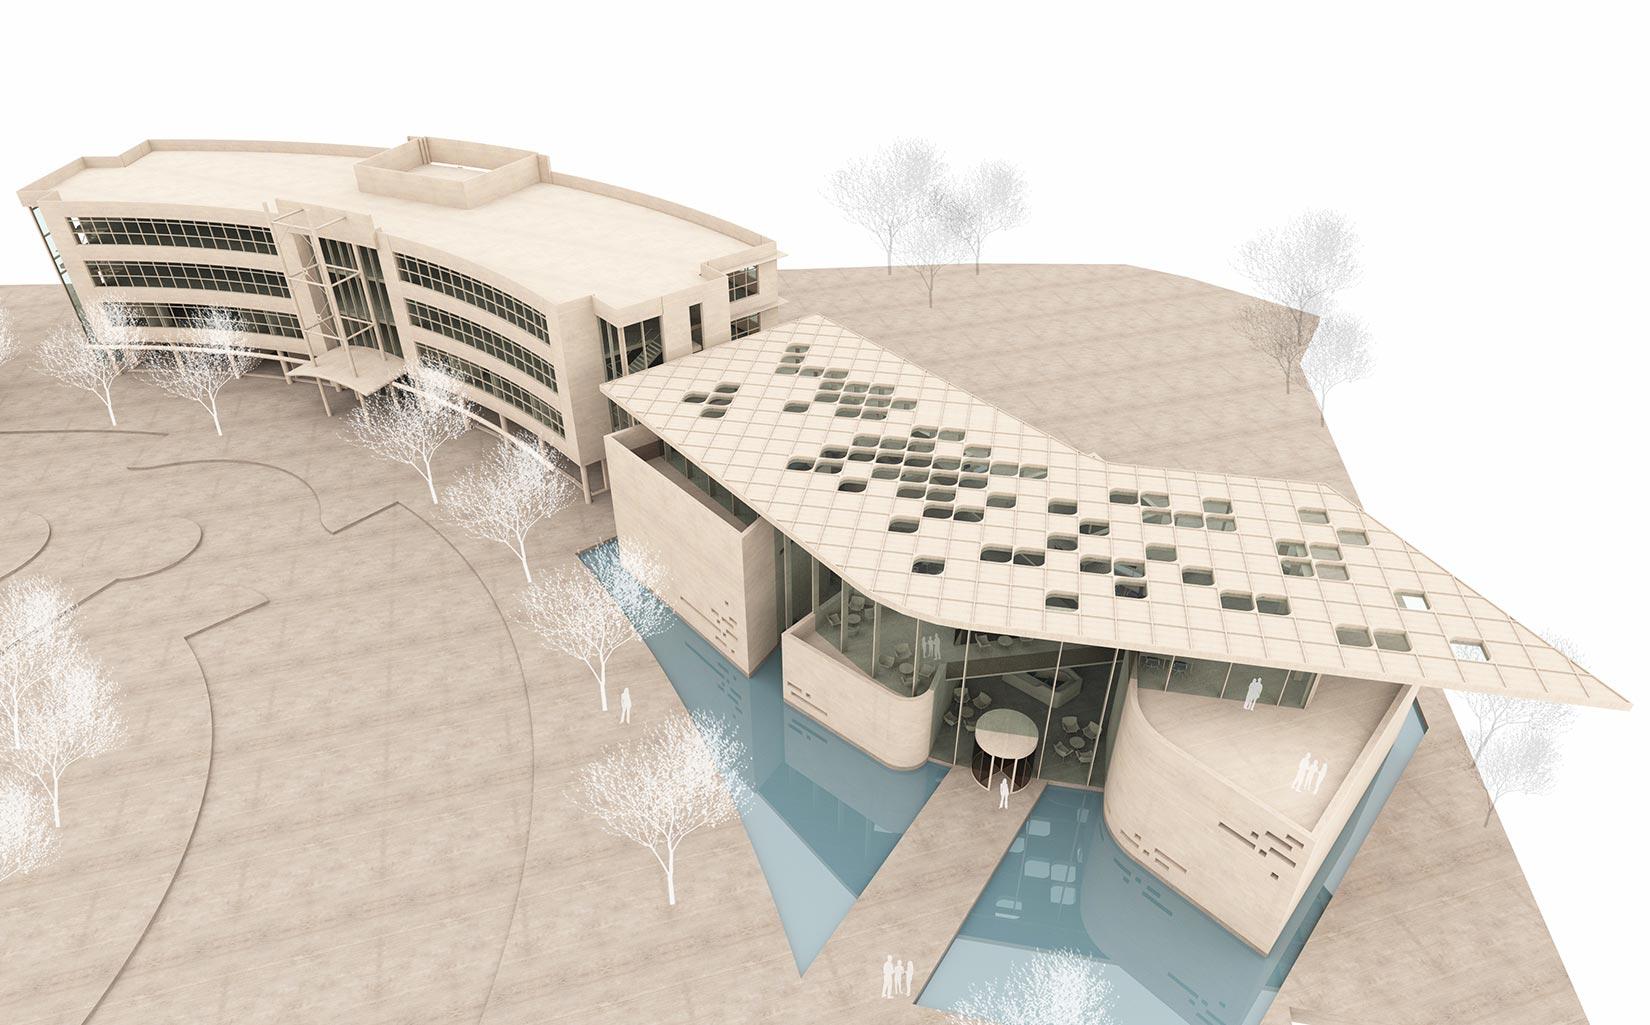 B. Braun Innovation, Communication & Education Centre, Sheffield, Concept Model Aerial